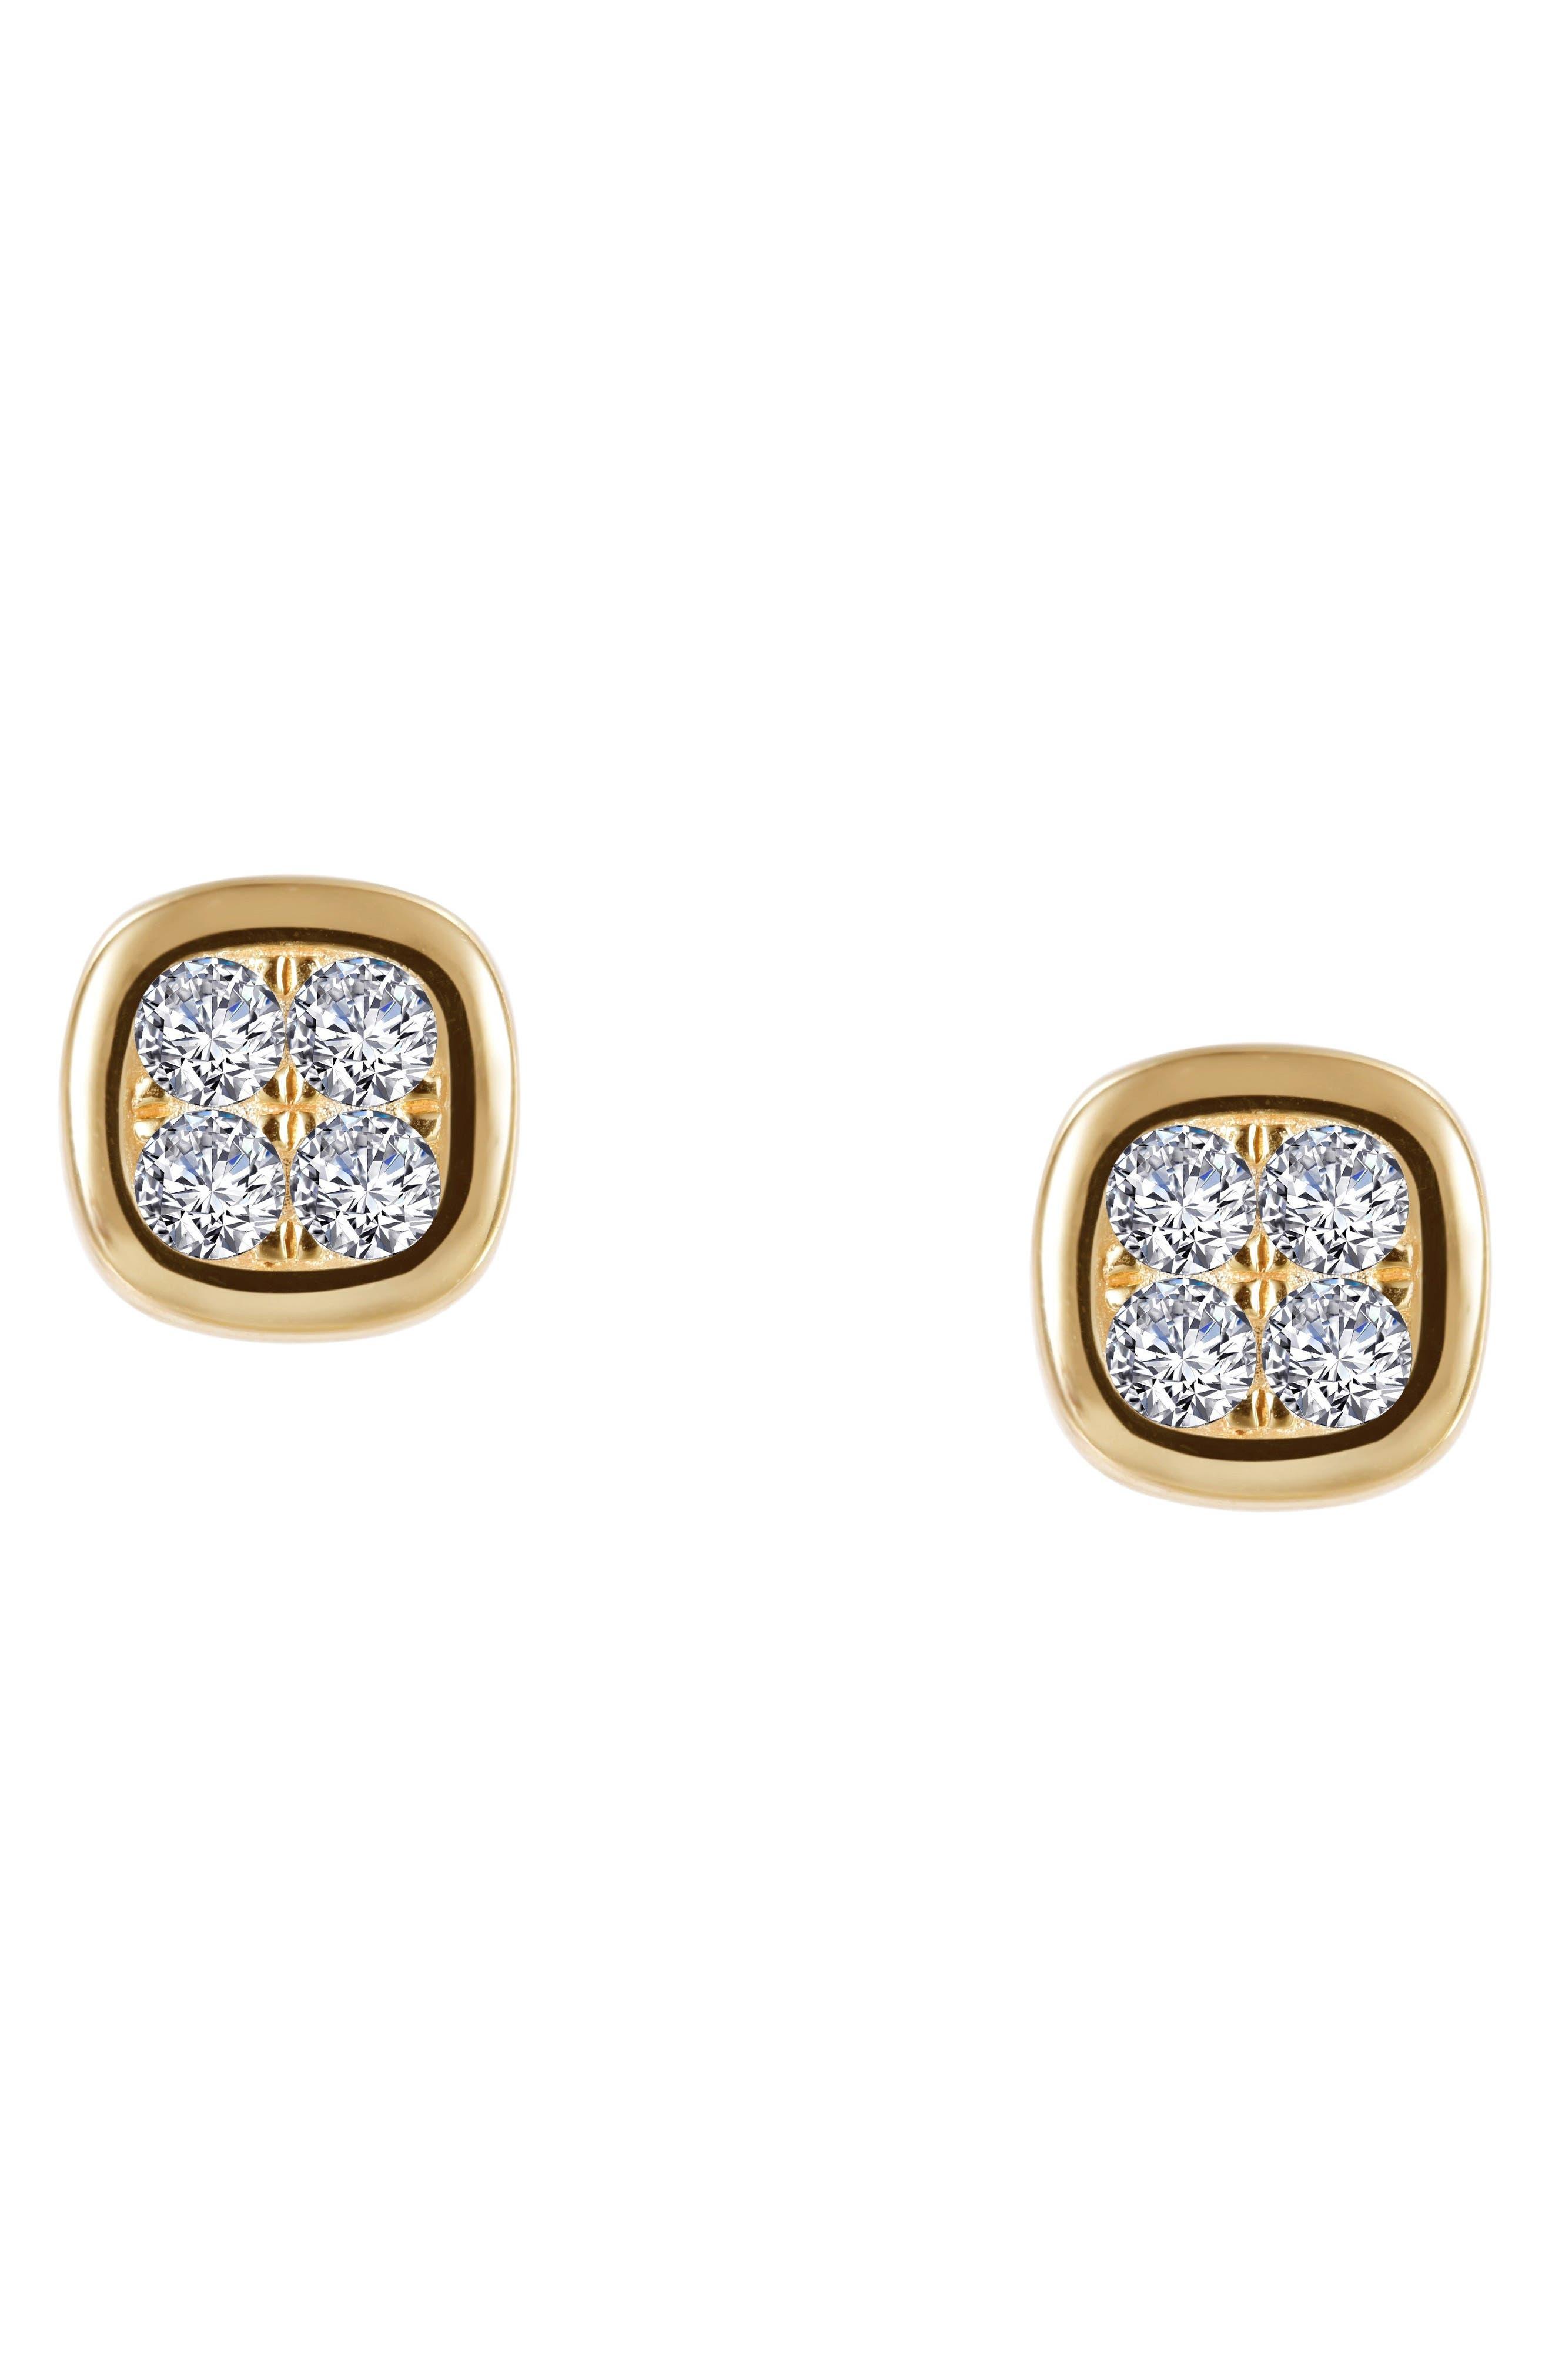 Bezel Stud Earrings,                         Main,                         color, Silver/ Gold/ Clear